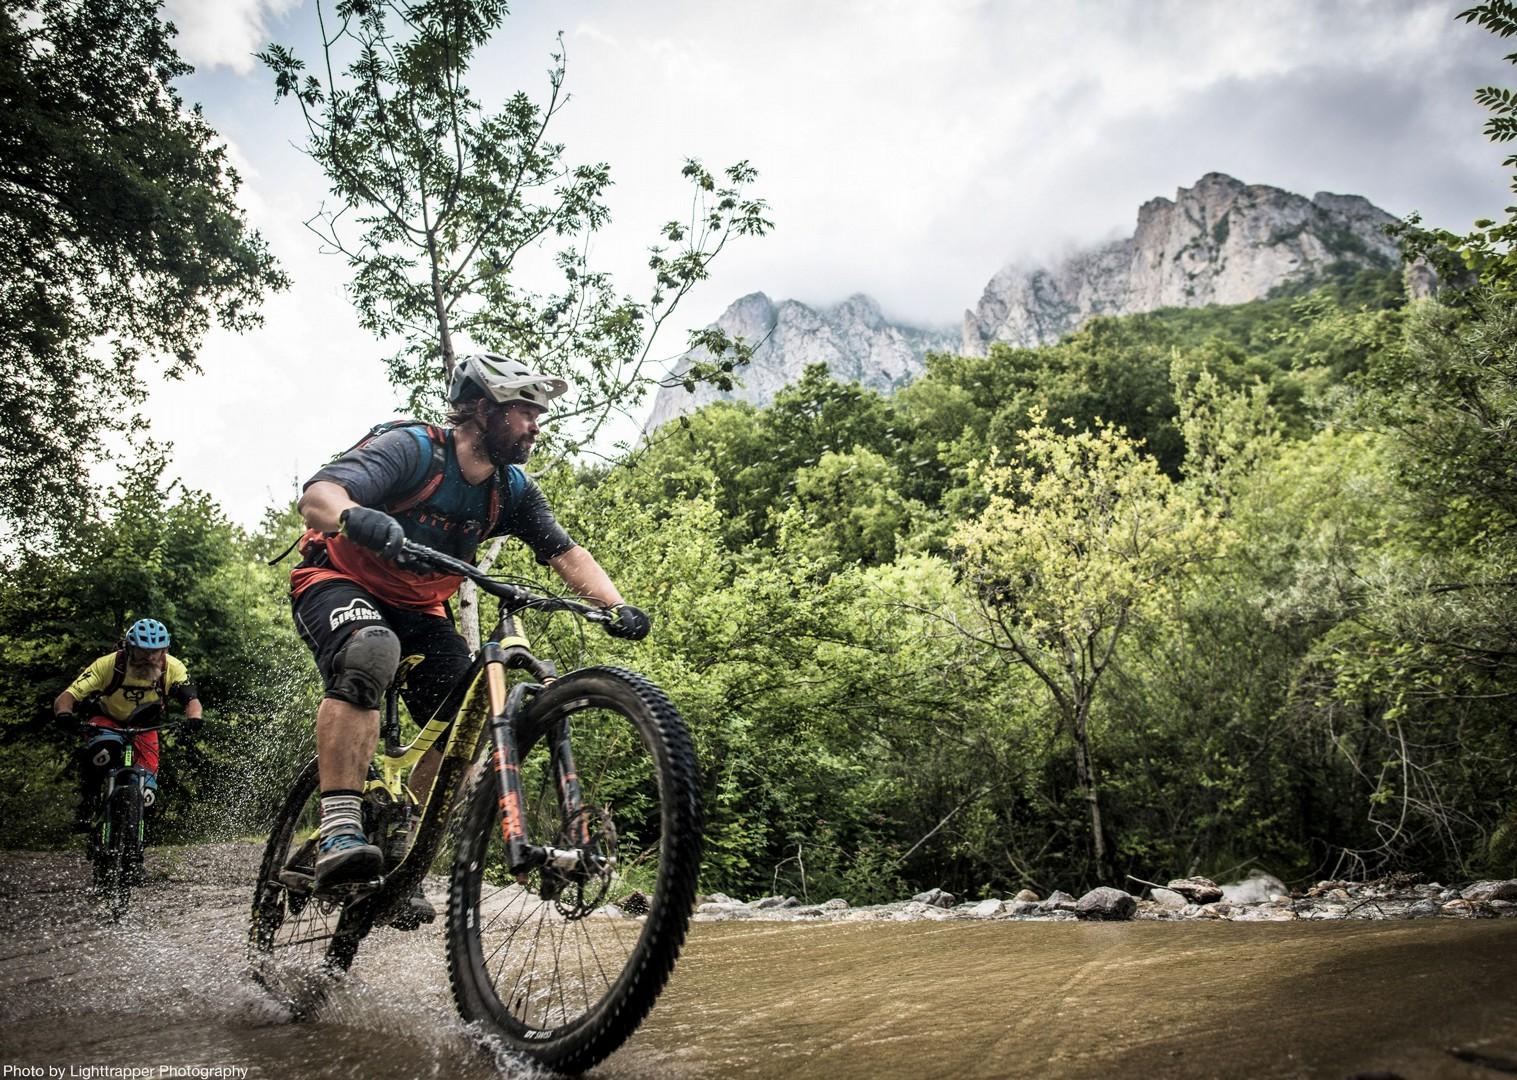 technical-singletrack-mountain-biking-northern-spain-picos-de-europa.jpg - Spain - Picos de Europa - Trans Picos - Guided Mountain Bike Holiday - Mountain Biking